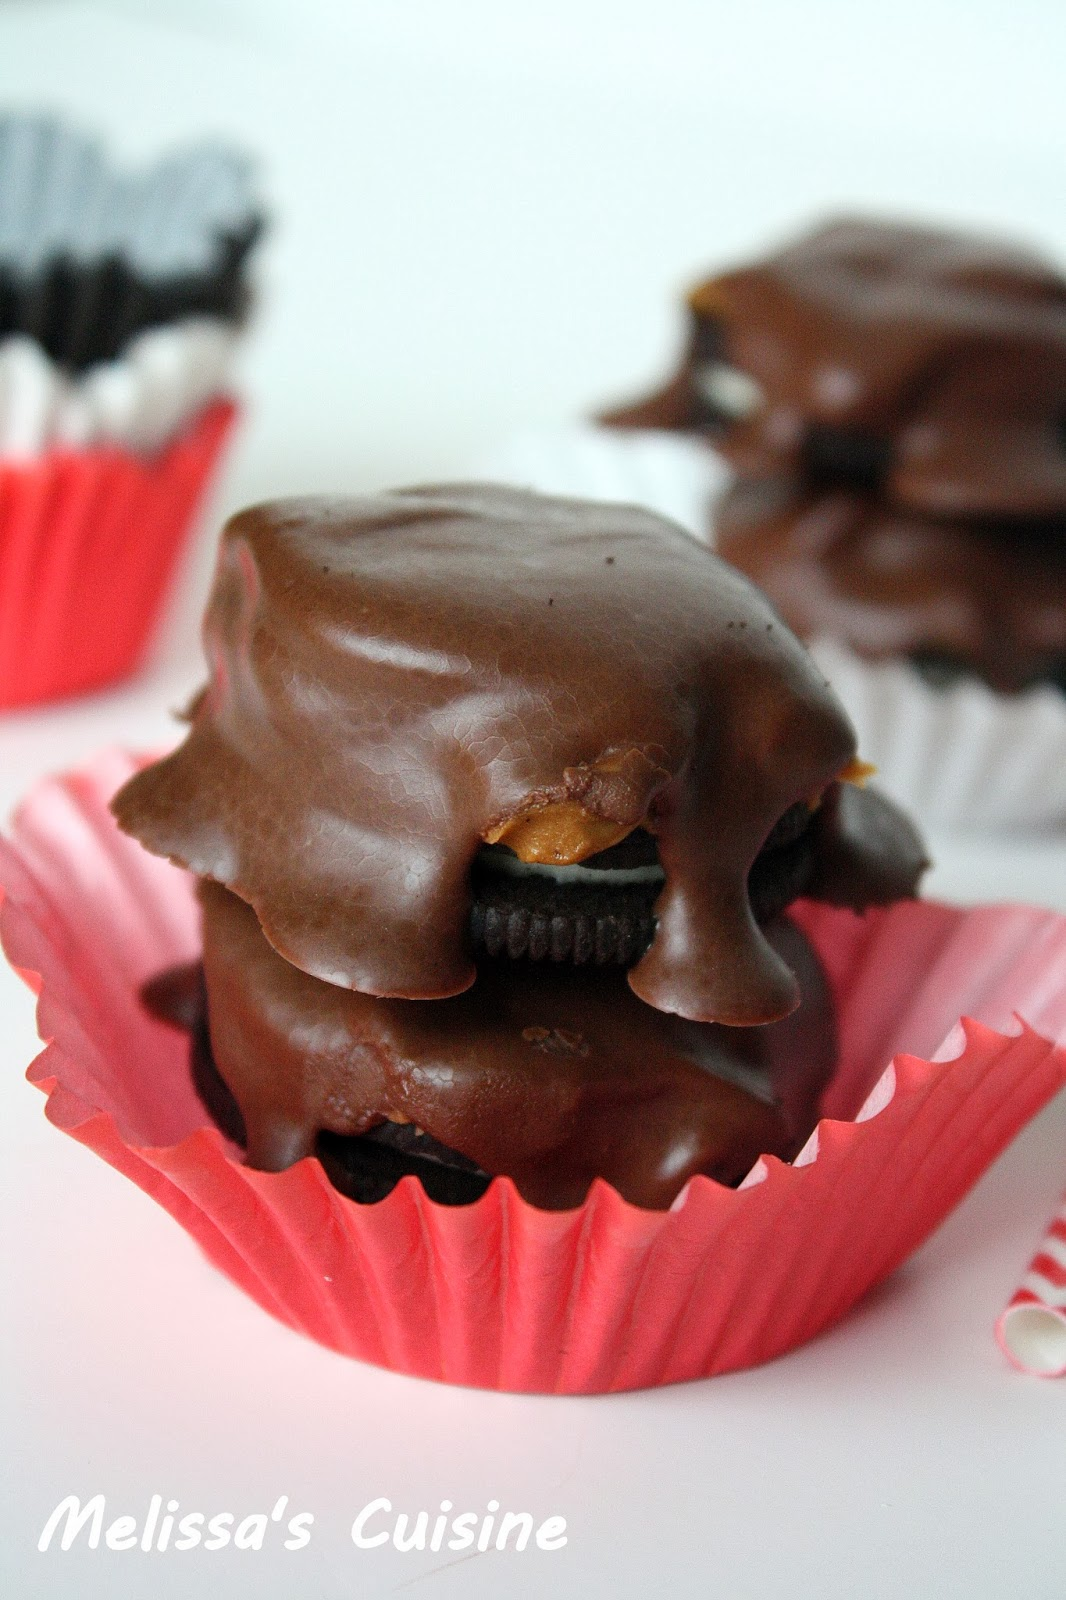 Melissa's Cuisine: Chocolate Covered Biscoff Oreos